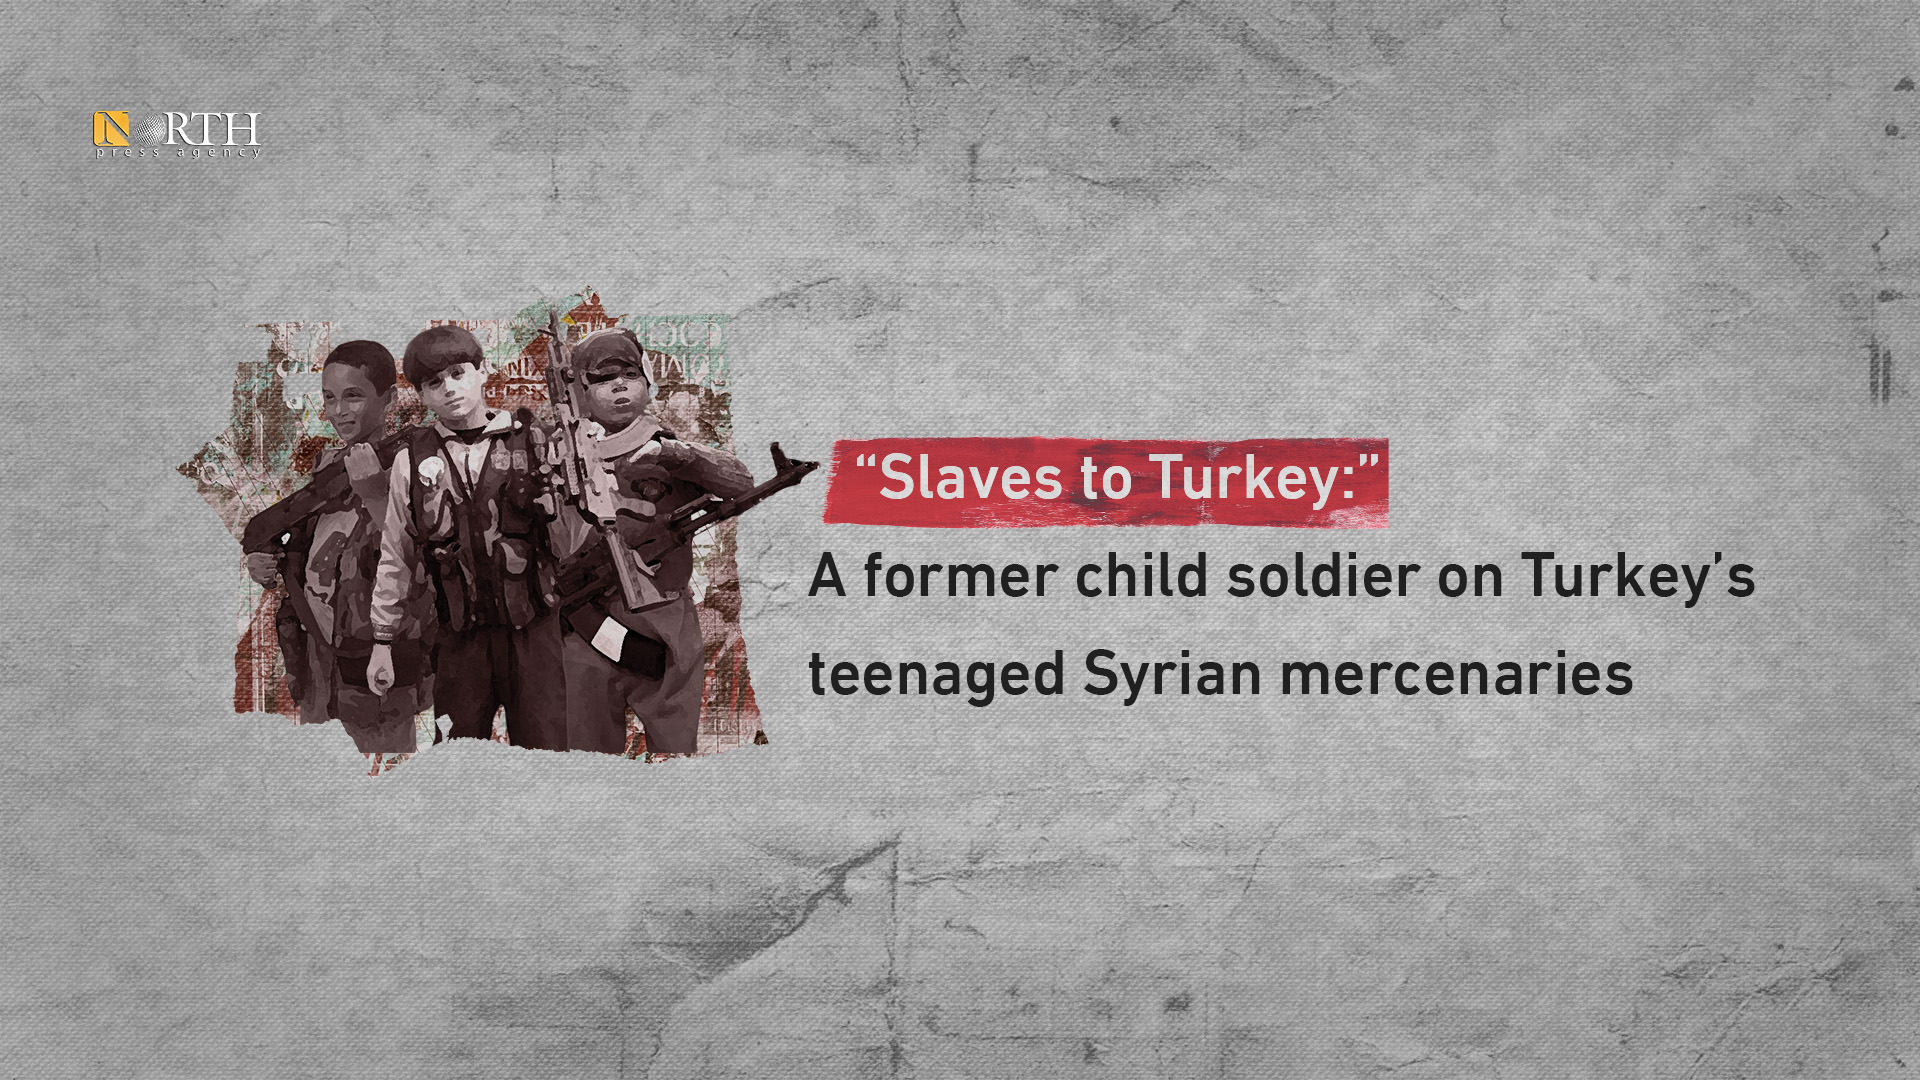 Slaves to Turkey - Erdogan recruiting Syrian children as sex slaves for his terrorists